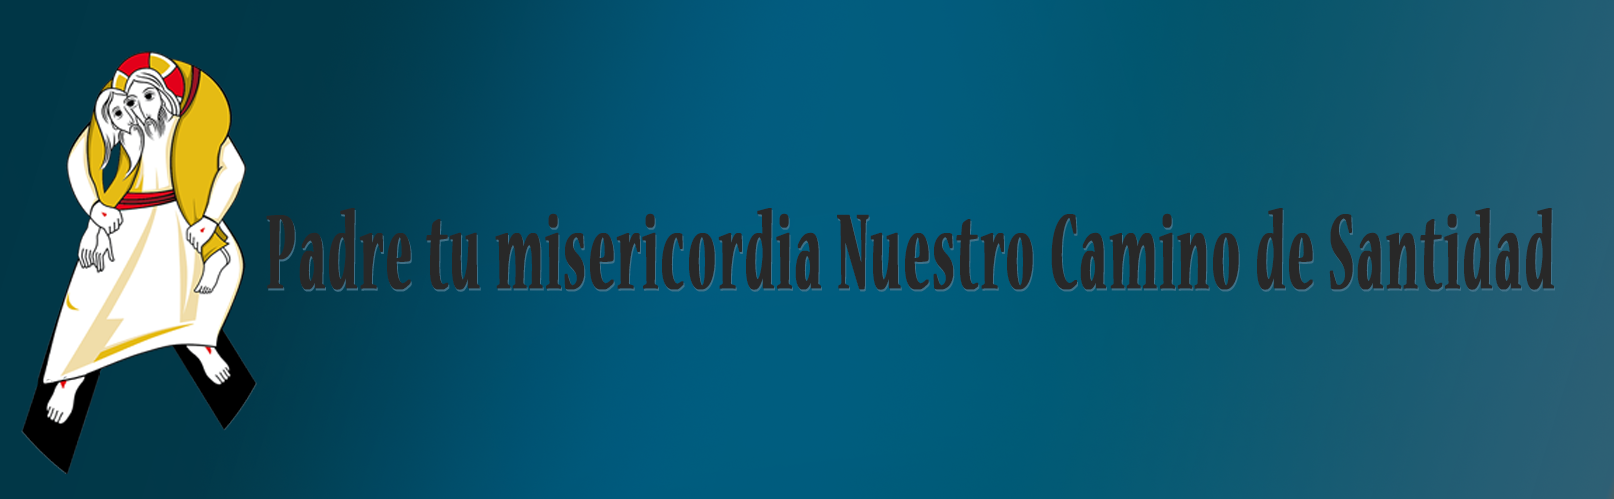 lema-misericordia-baner-web.png